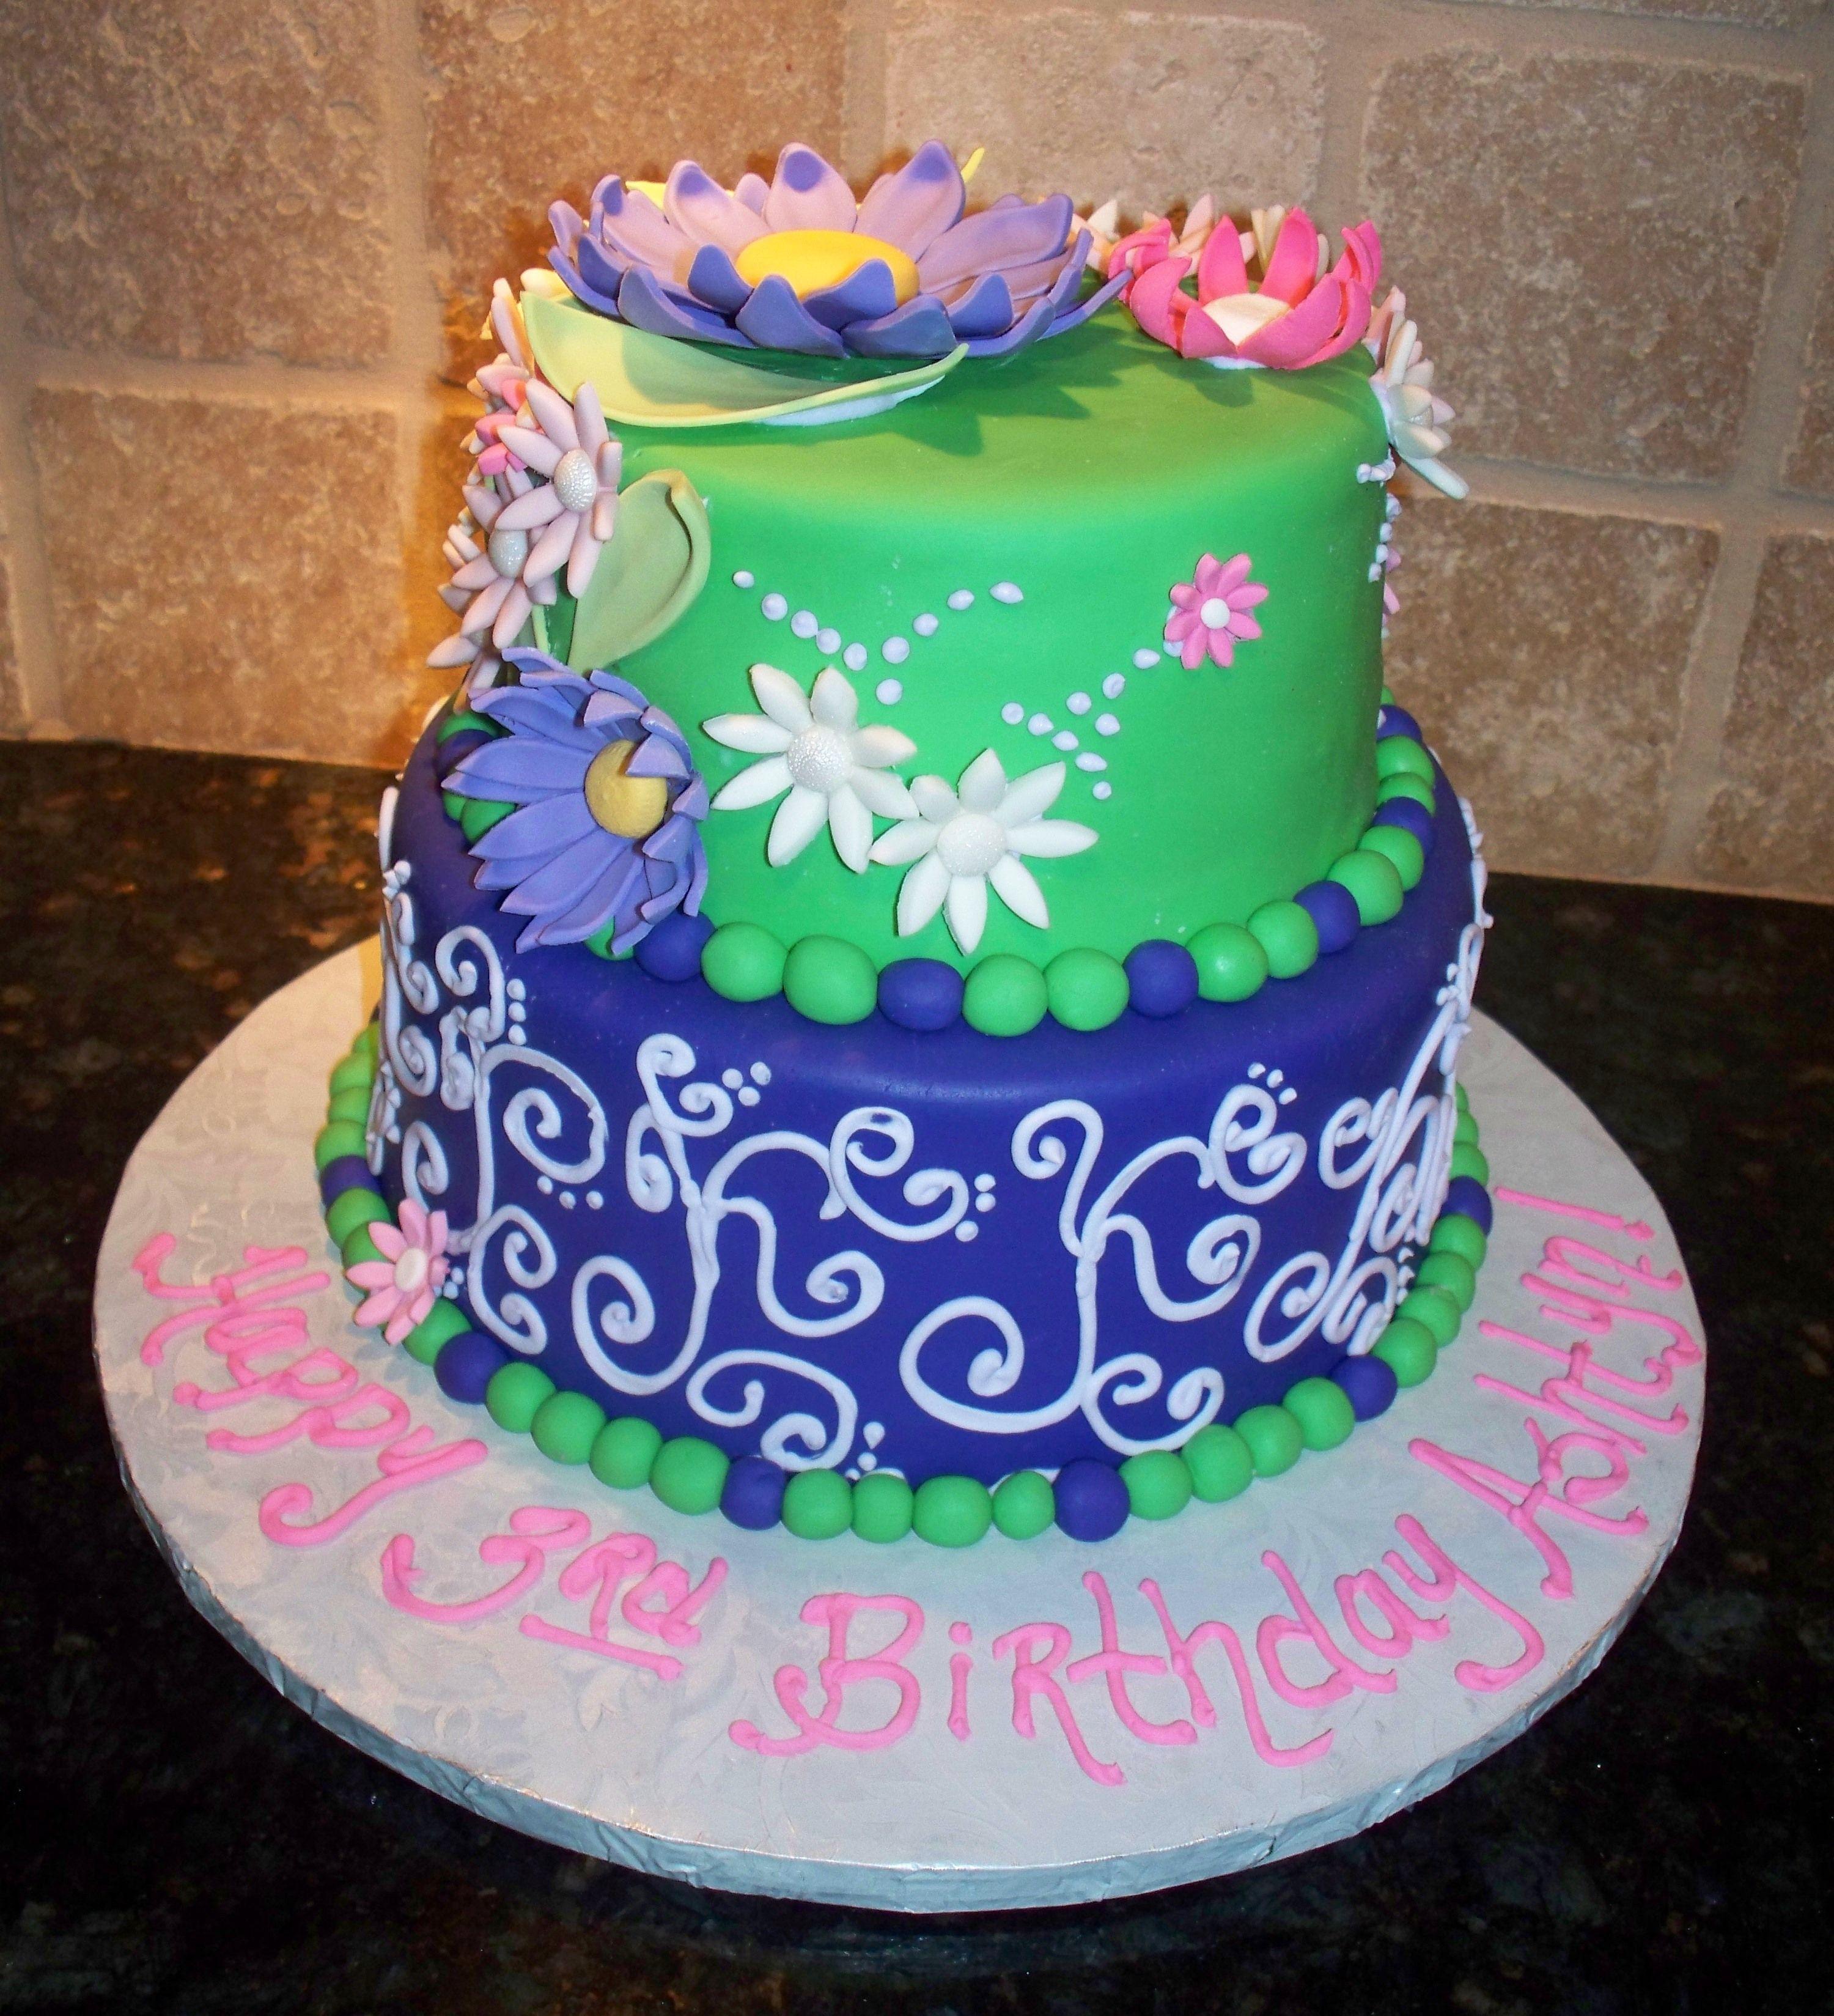 Ashtyn's Cake - Fondant cake with fondant/gumpast flowers